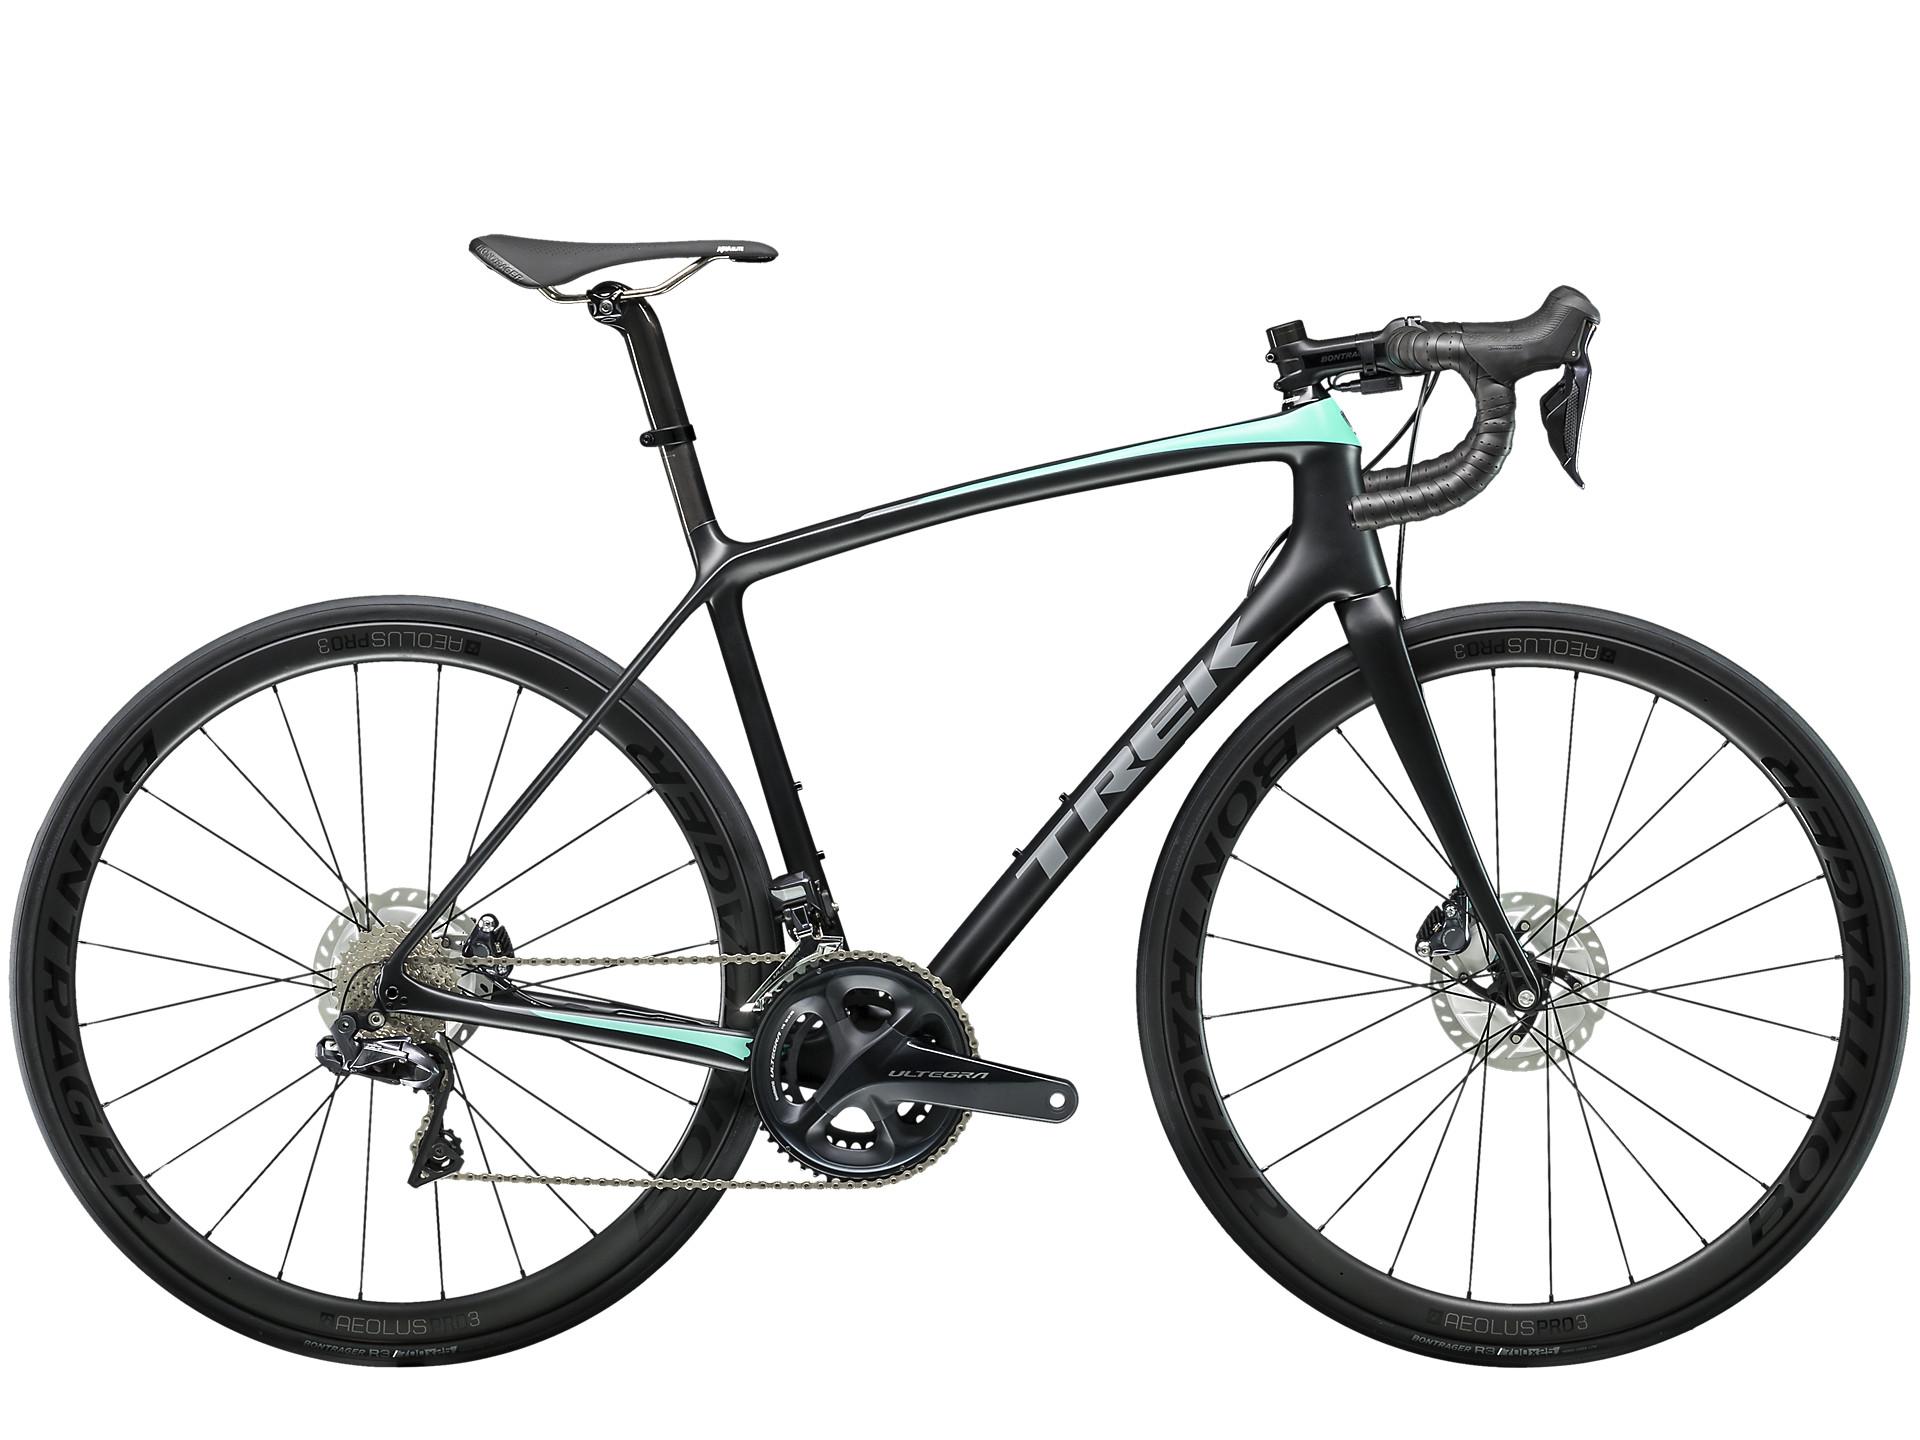 c06a00d7d19 Disc brake road bikes   Trek Bikes